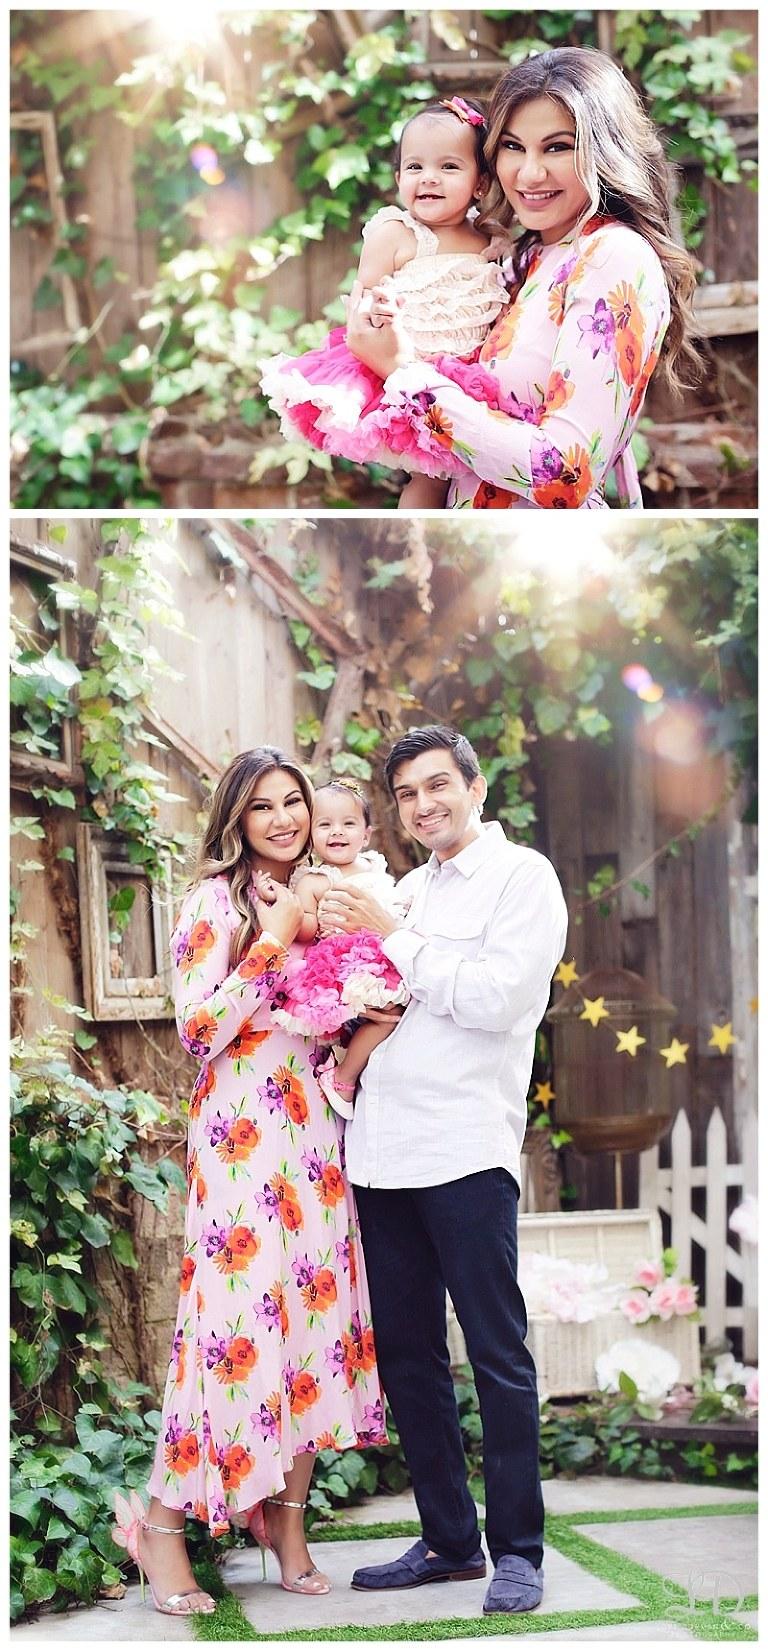 sweet maternity photoshoot-lori dorman photography-maternity boudoir-professional photographer_3817.jpg